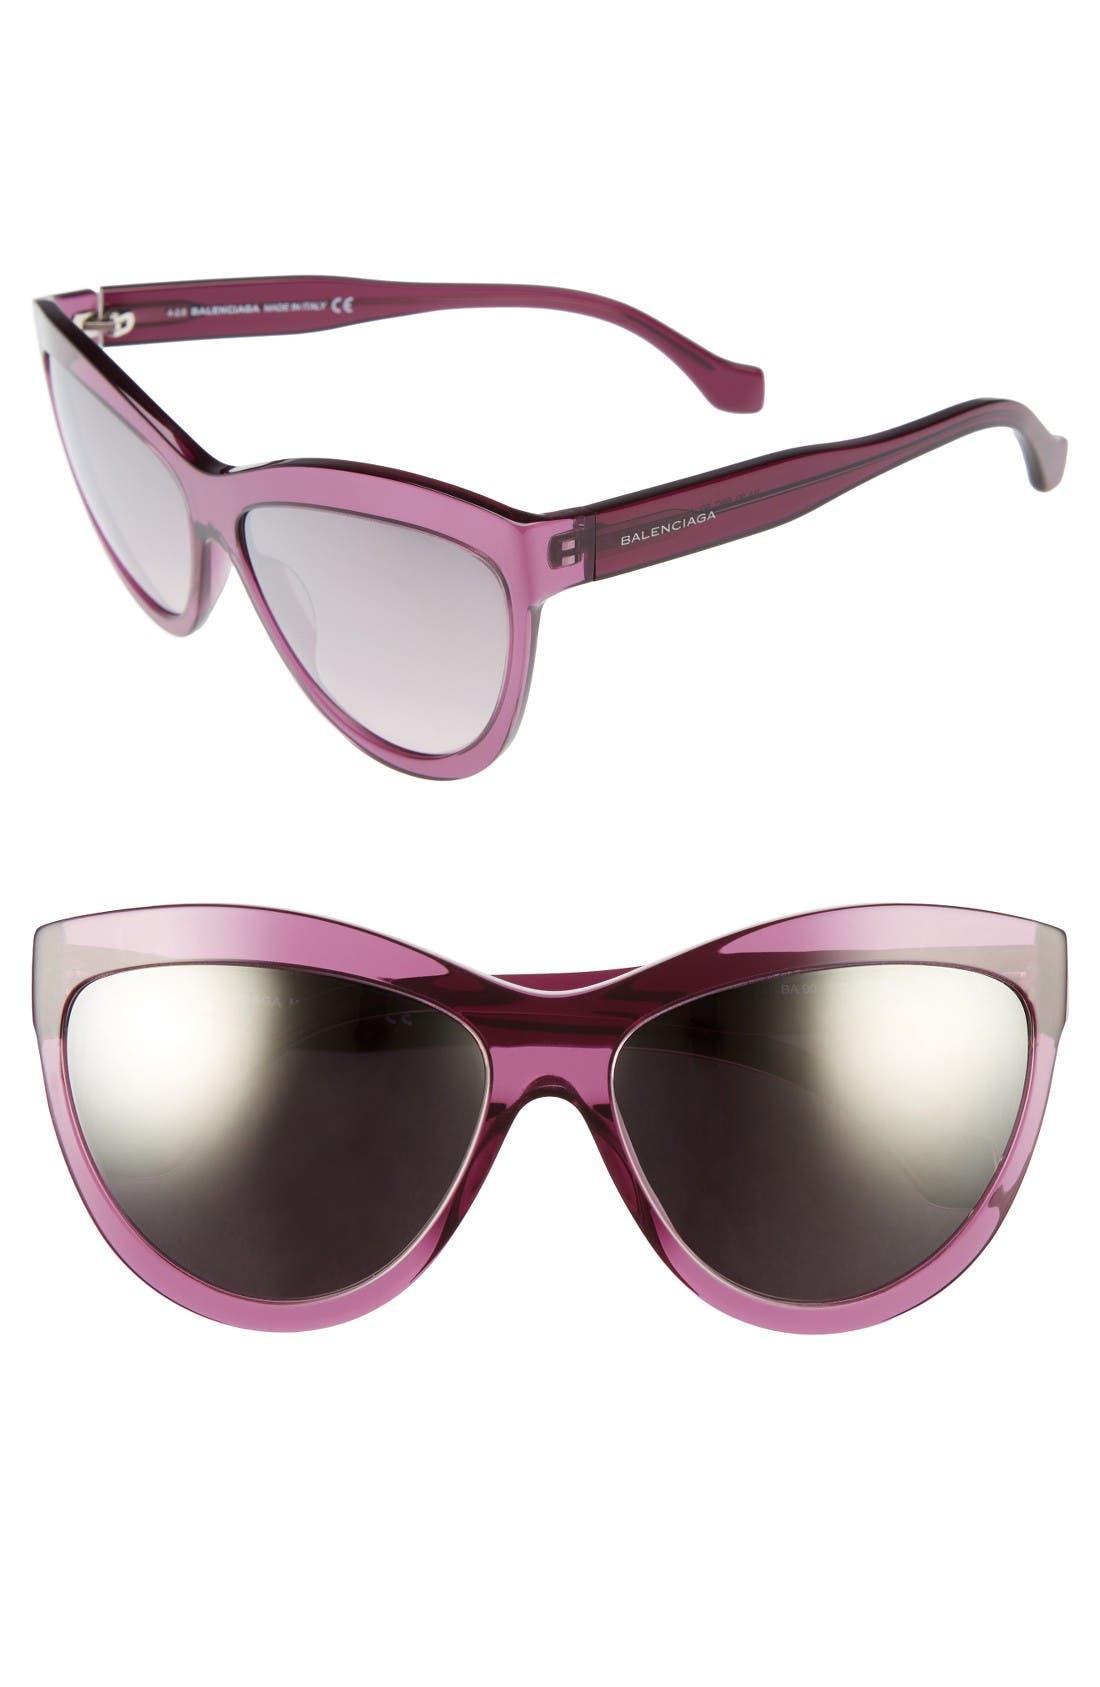 Main Image - Balenciaga 60mm Sunglasses